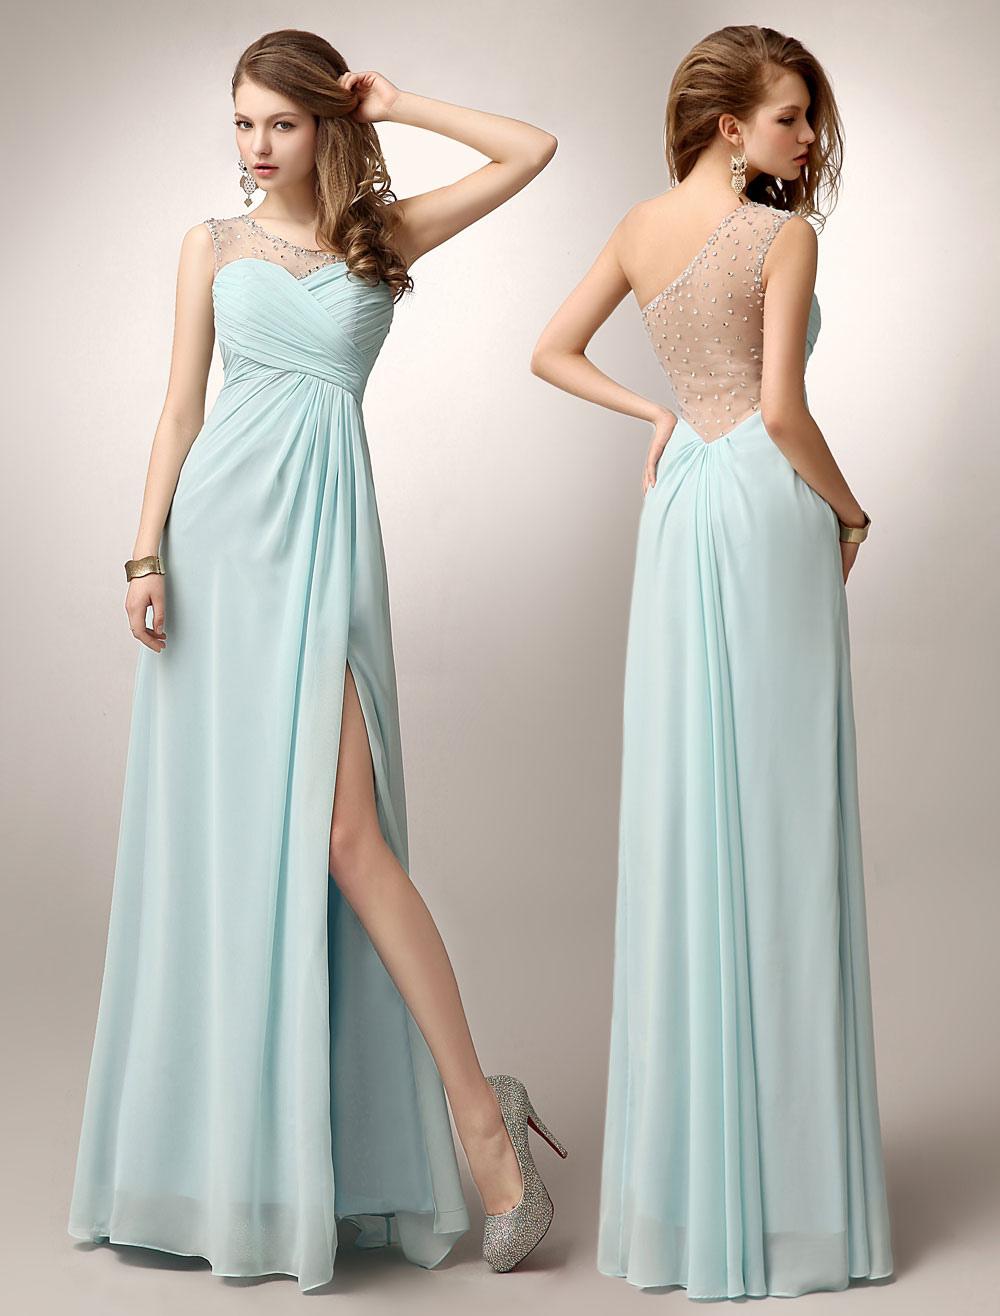 prom dresses long 2018 Mint Green One Shoulder High Split beaded formal party dress